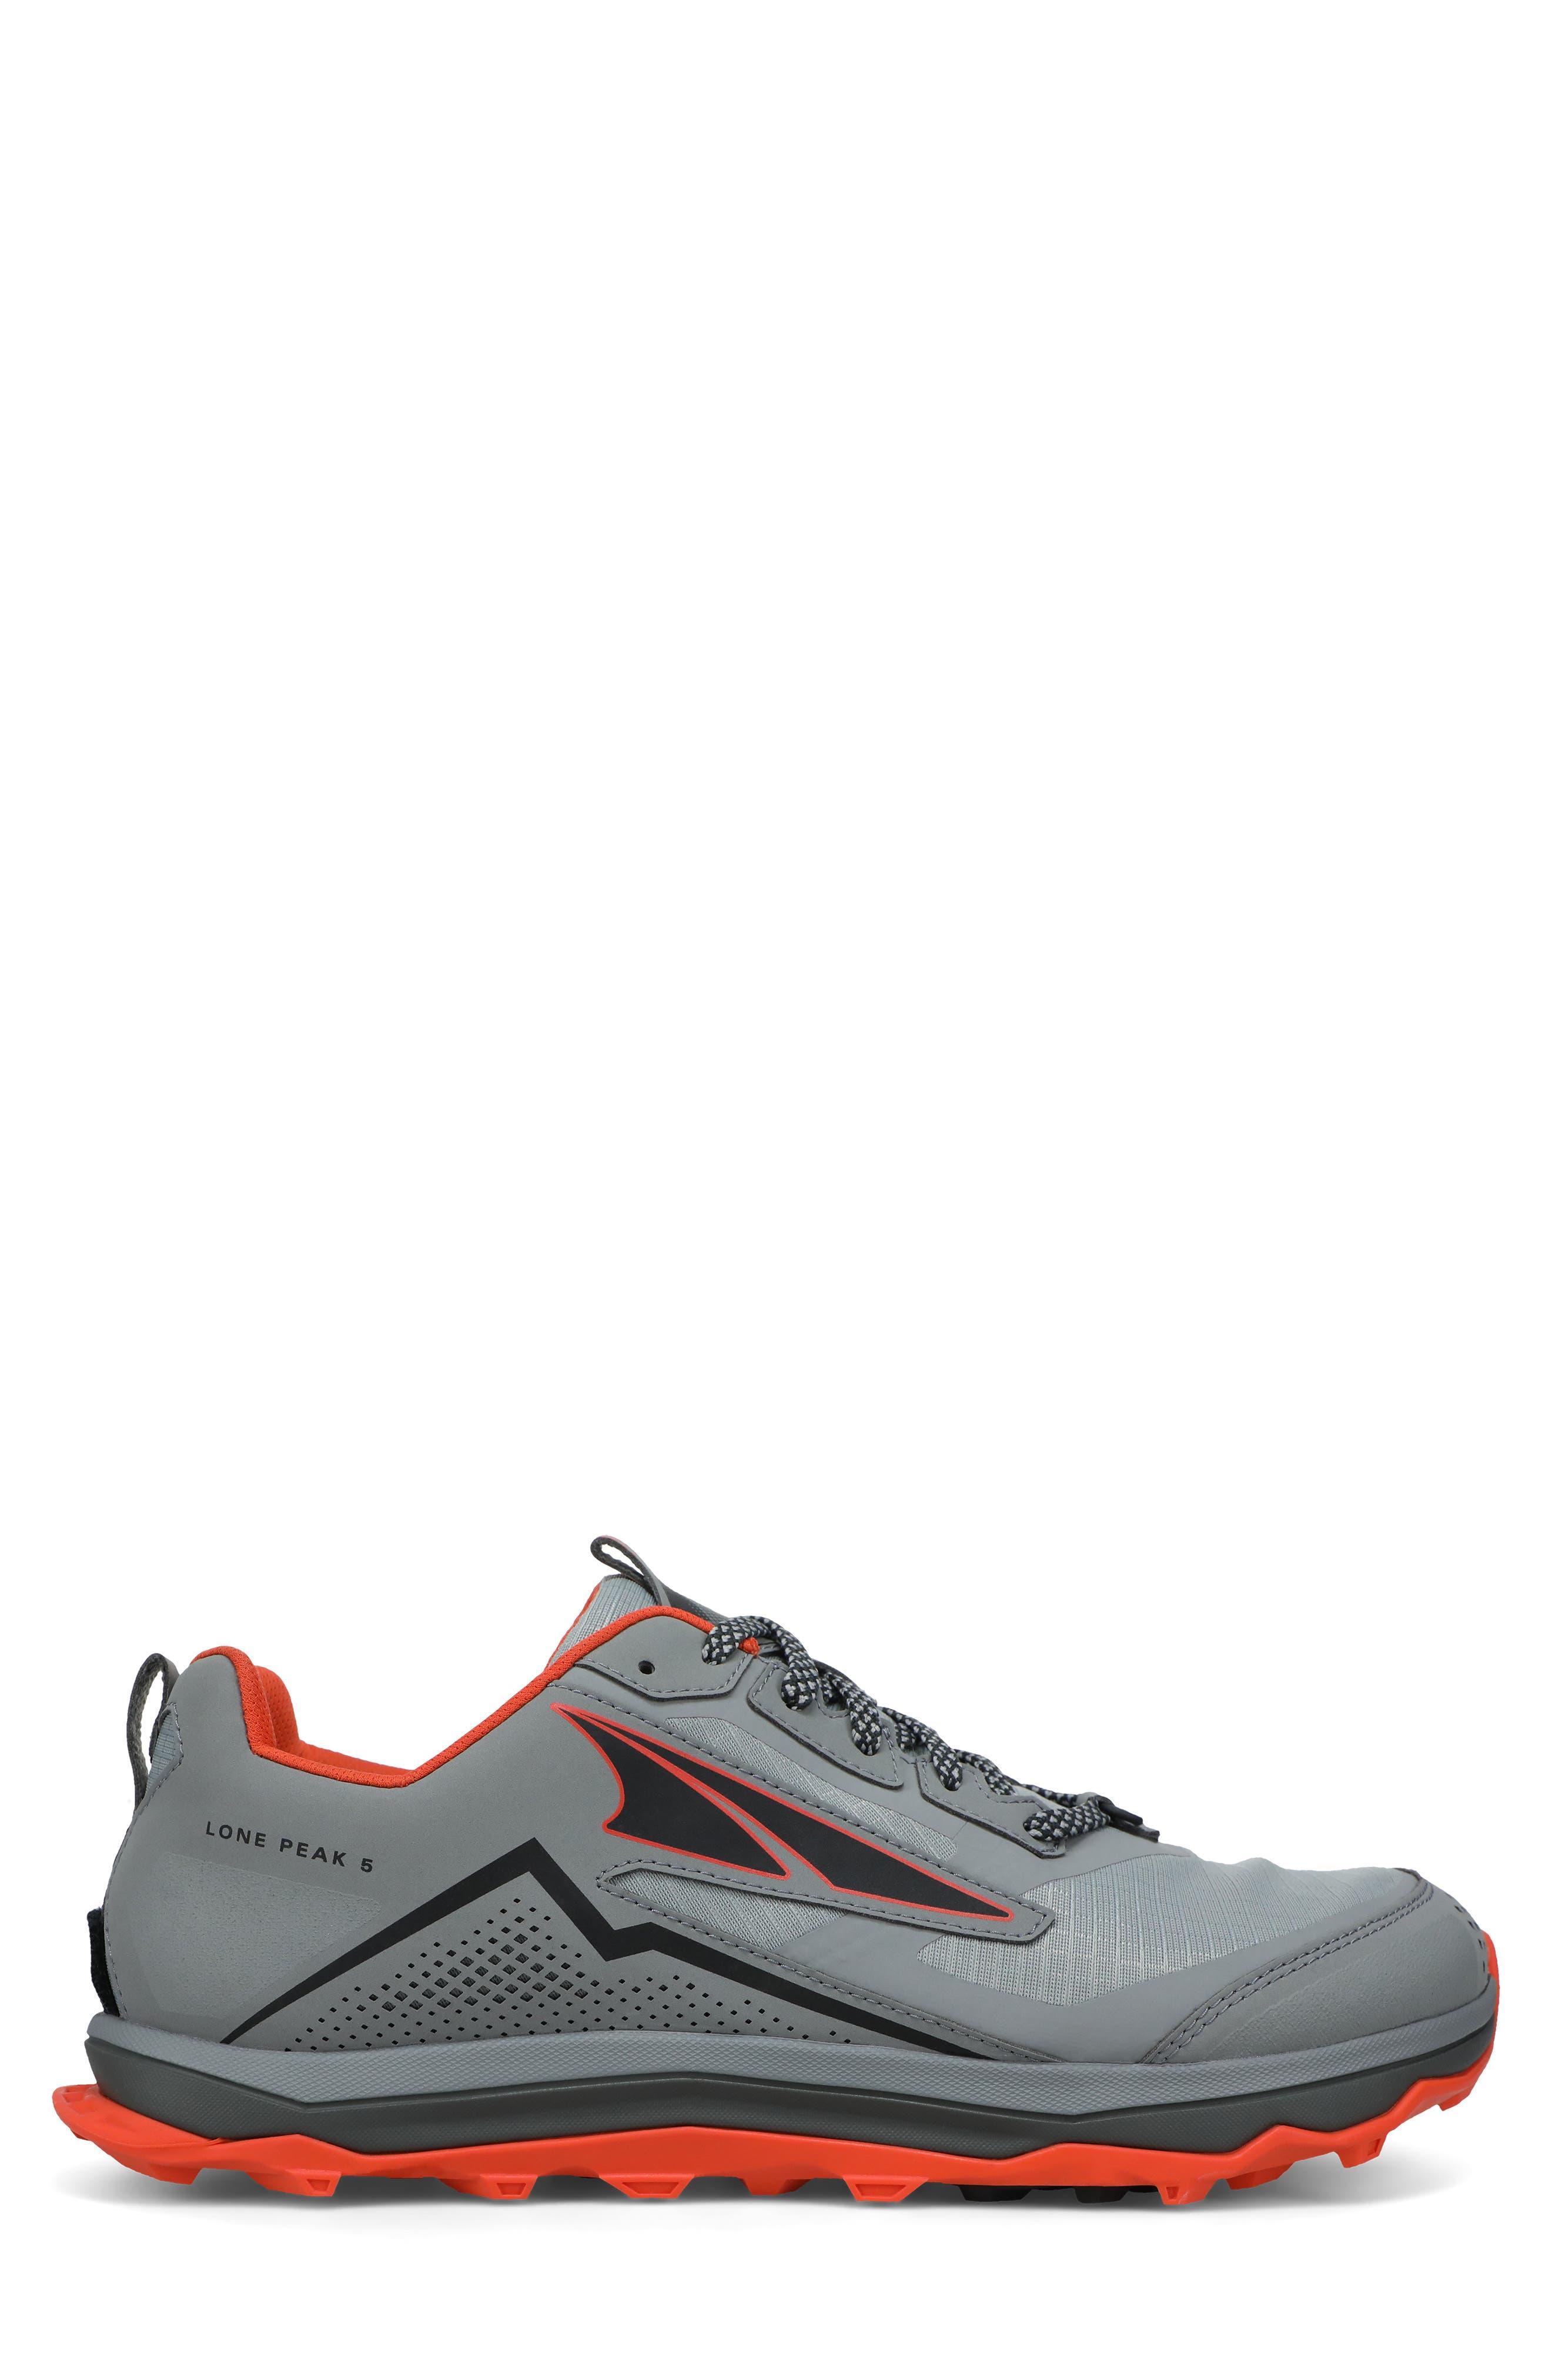 Lone Peak 5 Trail Running Shoe